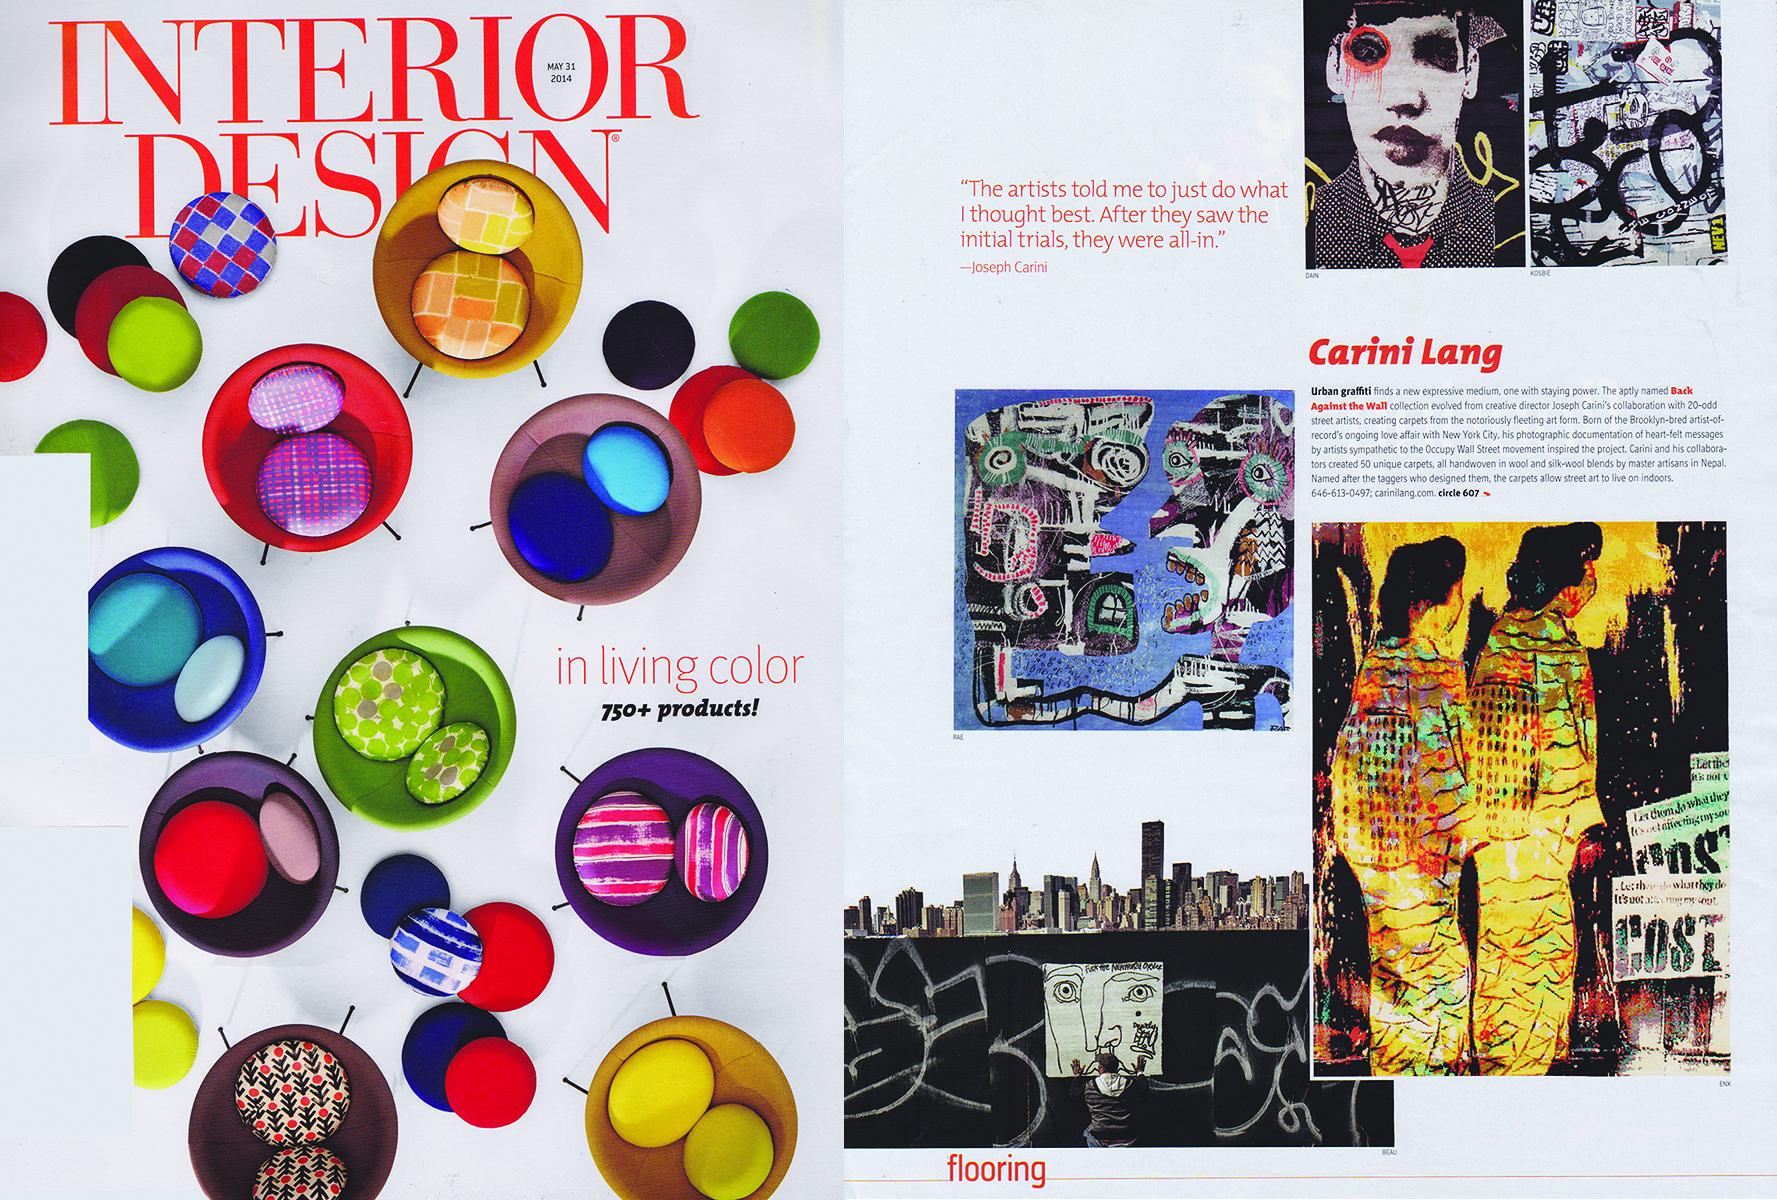 interiordesign_editorial.jpg